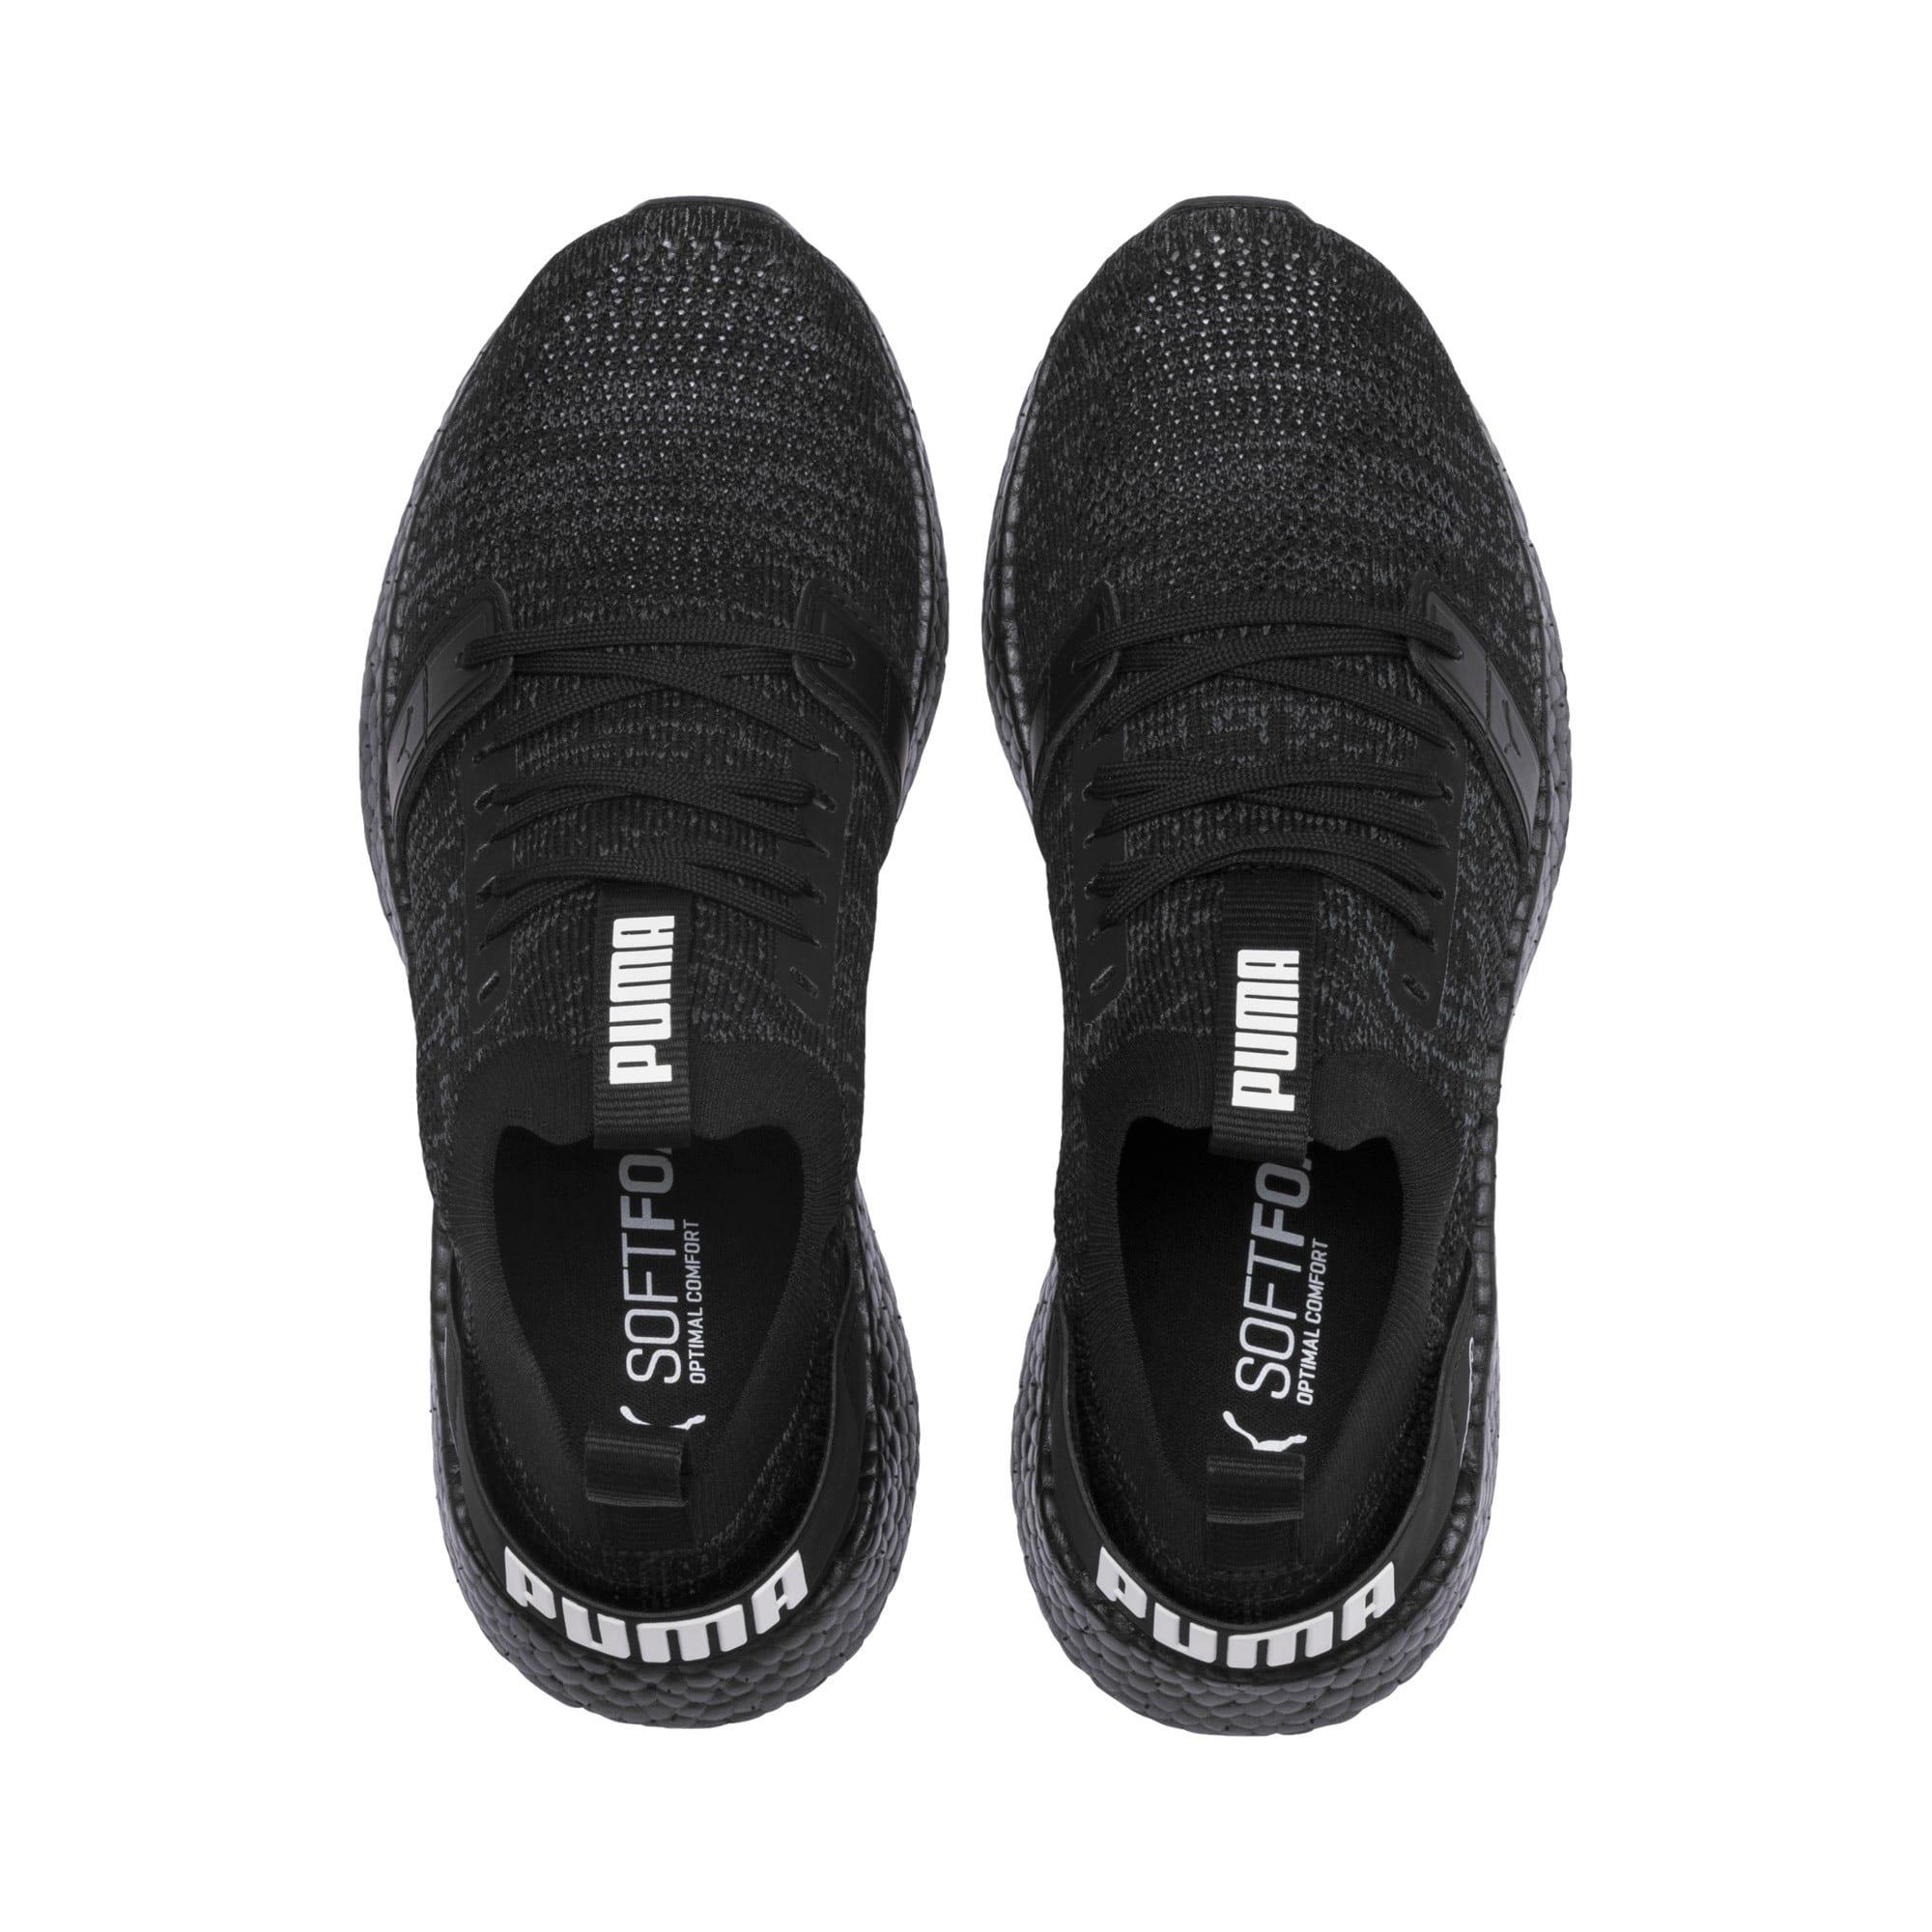 Thumbnail 7 of NRGY Neko Engineer Knit Women's Running Shoes, Puma Black-Puma Black, medium